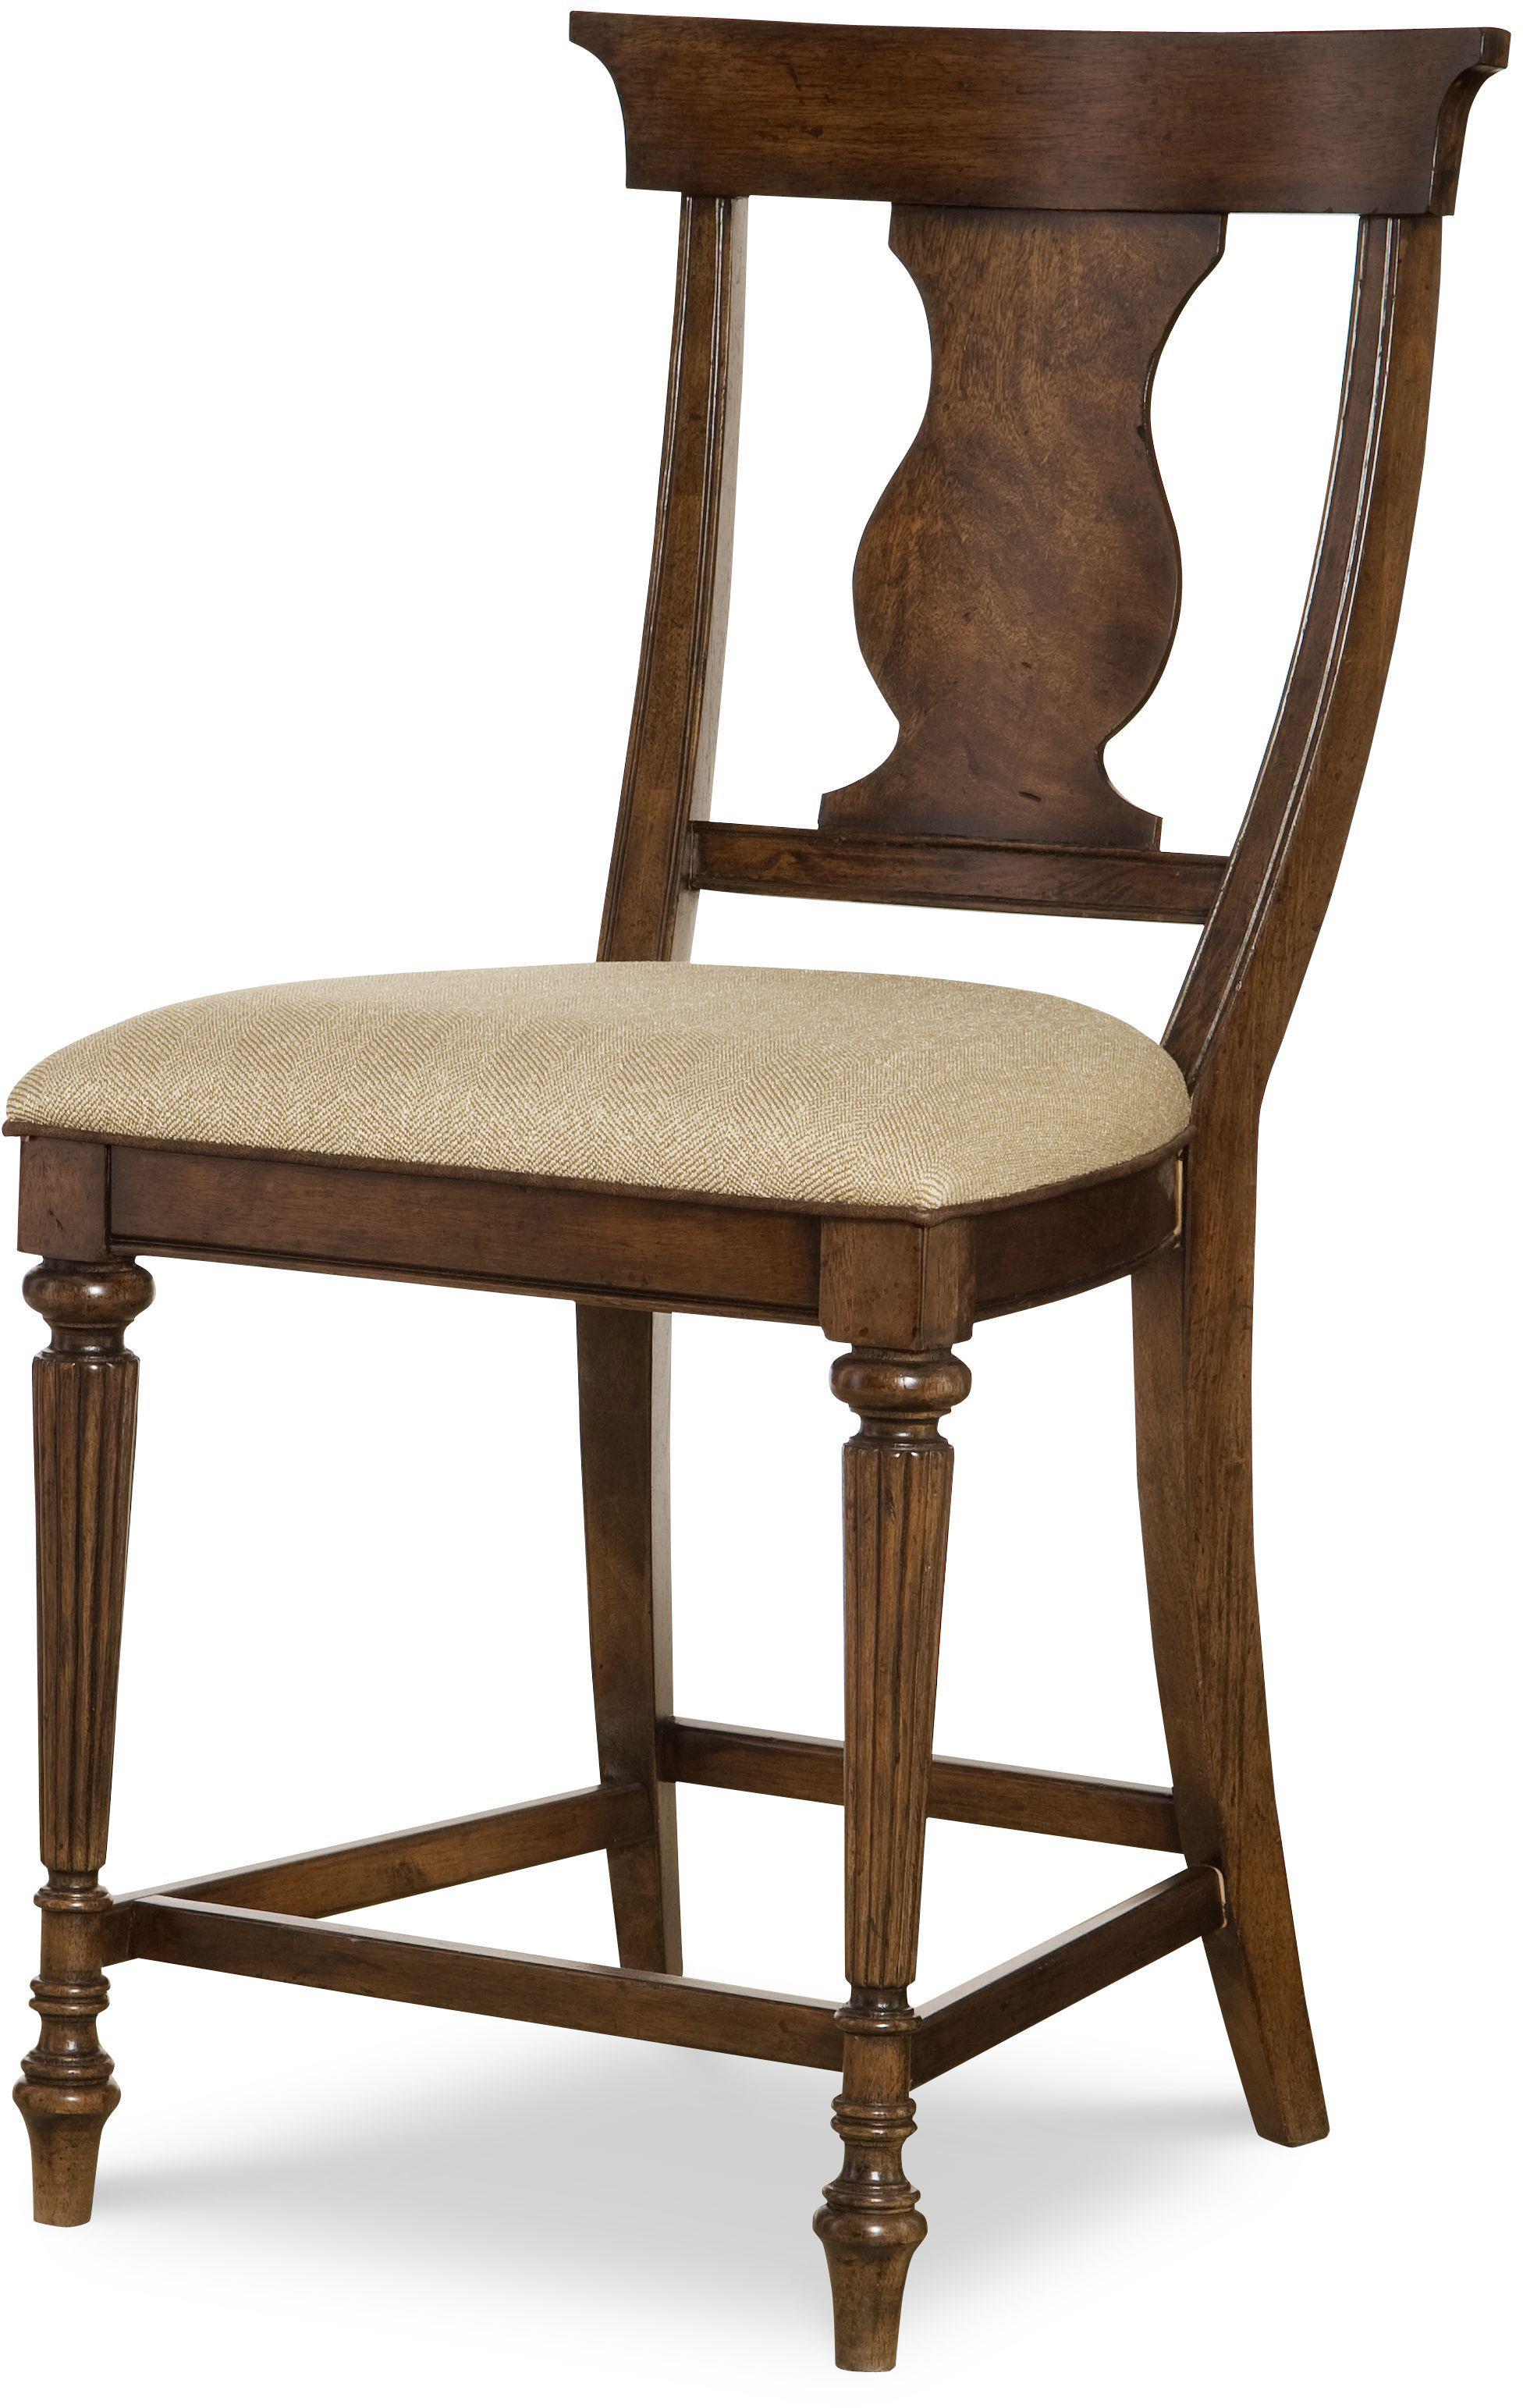 Legacy Classic Barrington Farm Pub Chair  - Item Number: 5200-945 KD